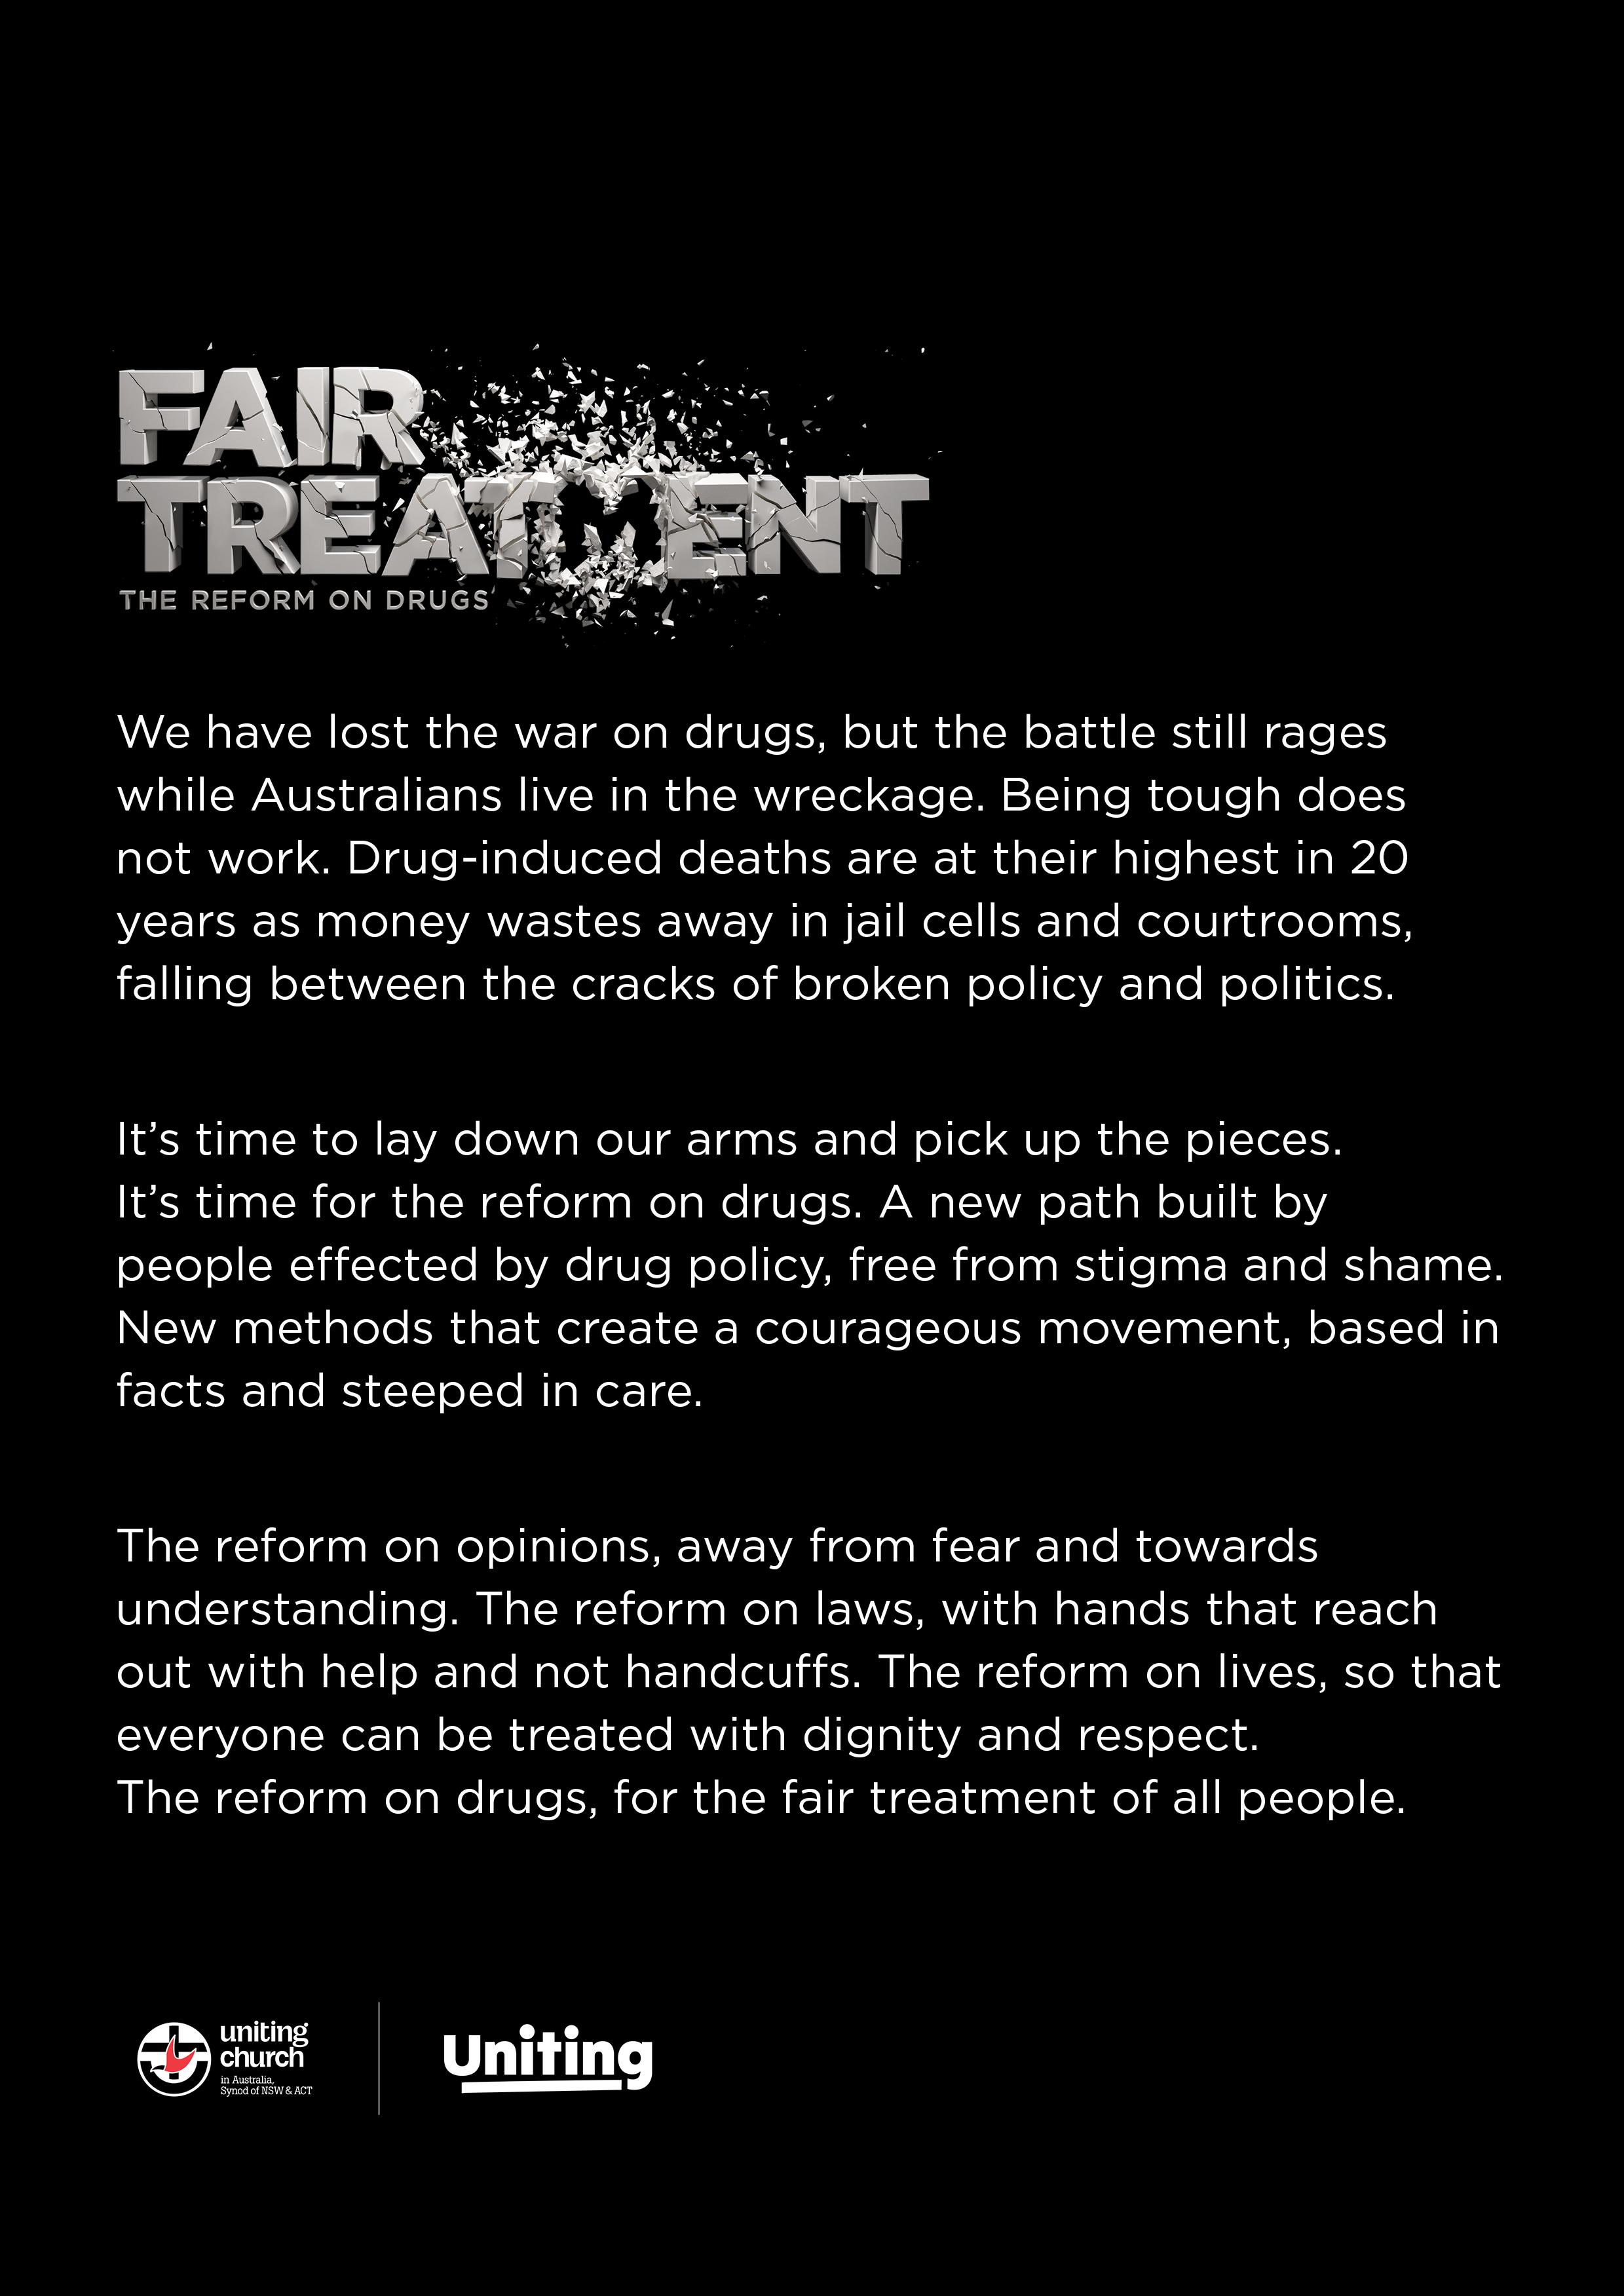 Fair_Treatment_Manifesto-RGB.jpg